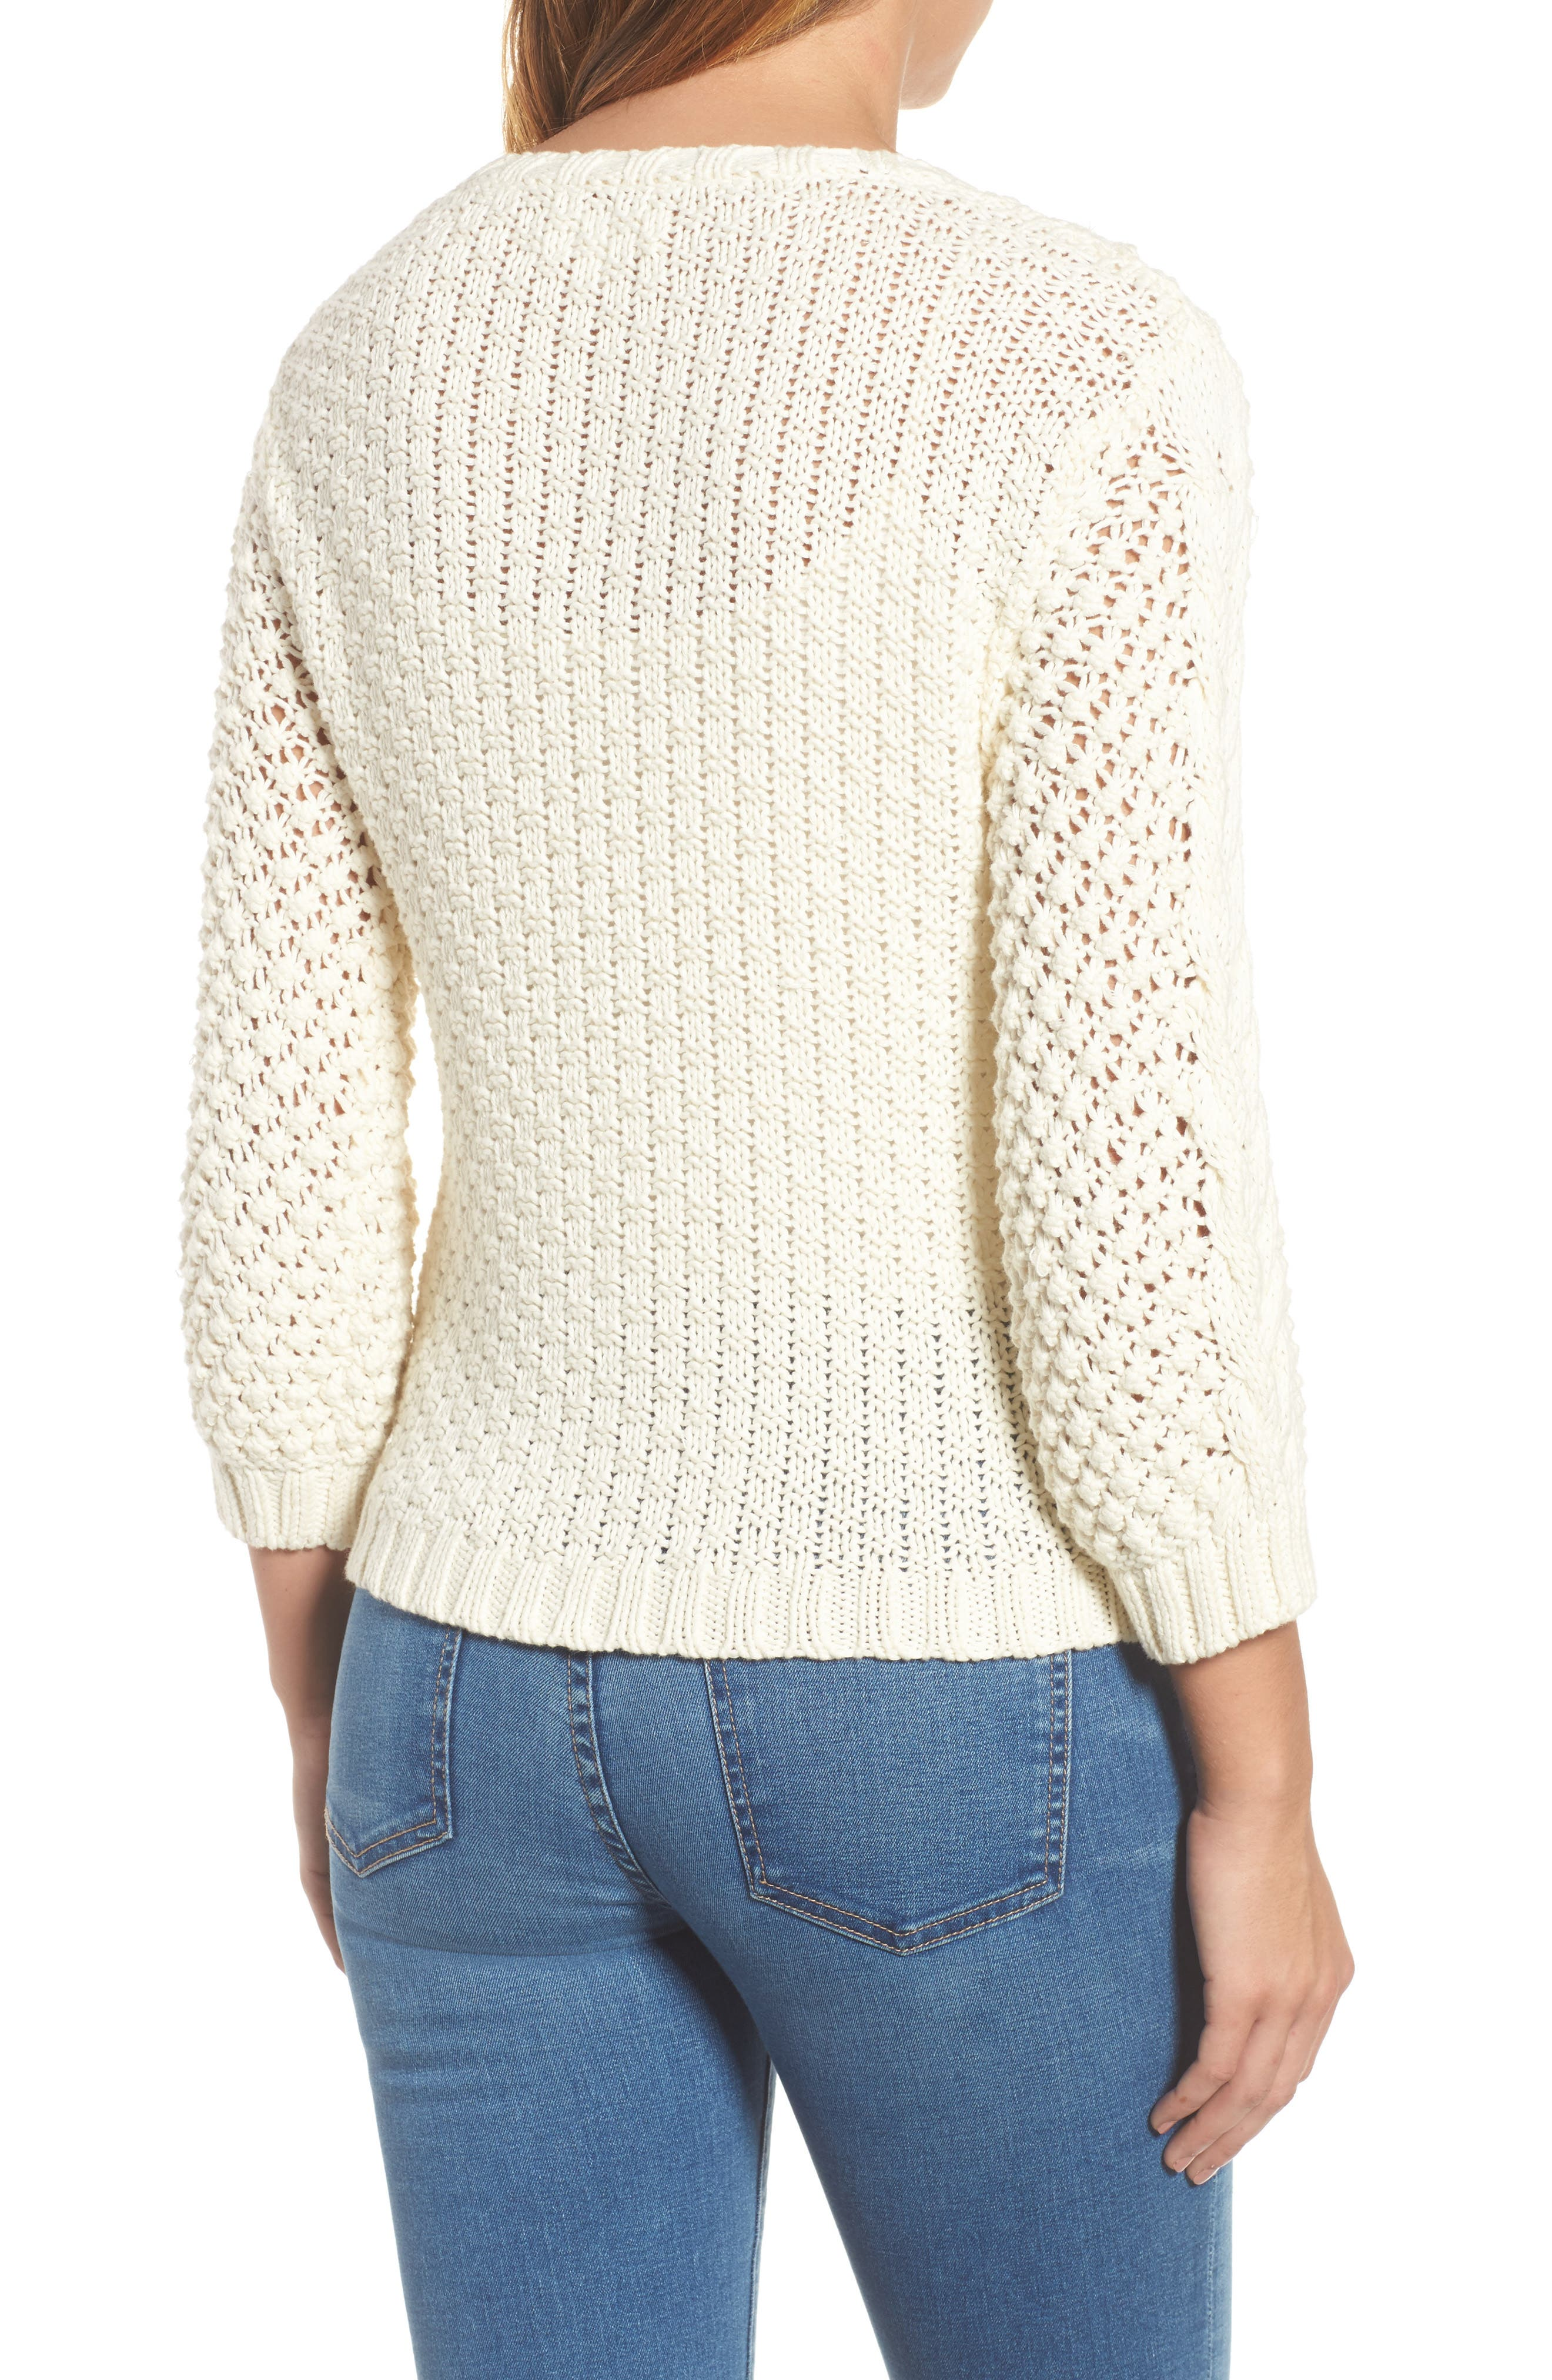 Popcorn Cable Sweater,                             Alternate thumbnail 2, color,                             Milk White